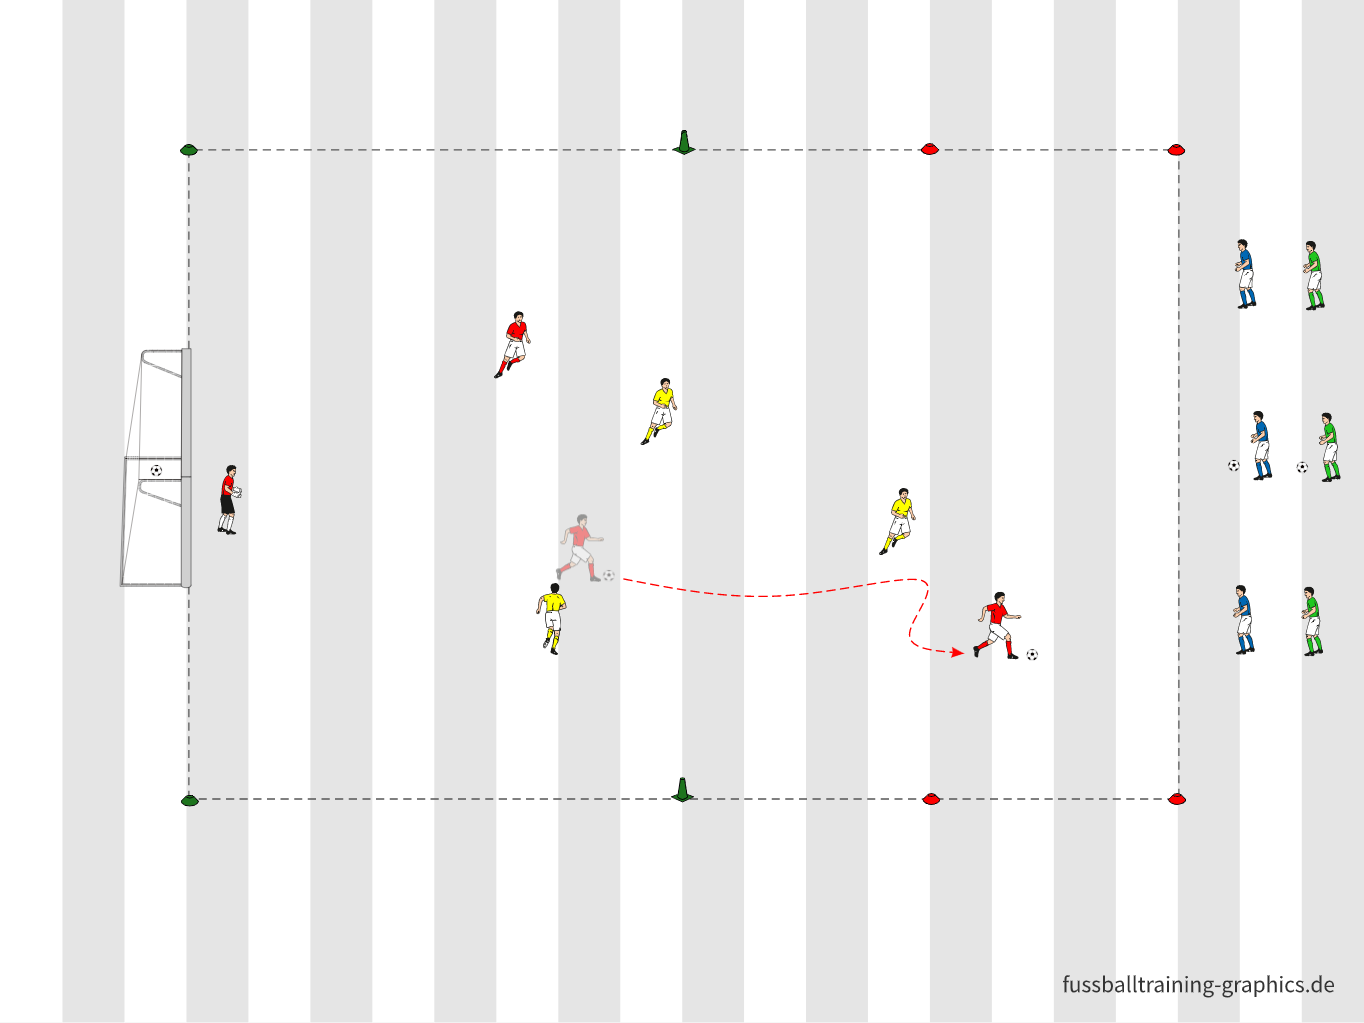 Spielform: Torwart + 2 gegen 3